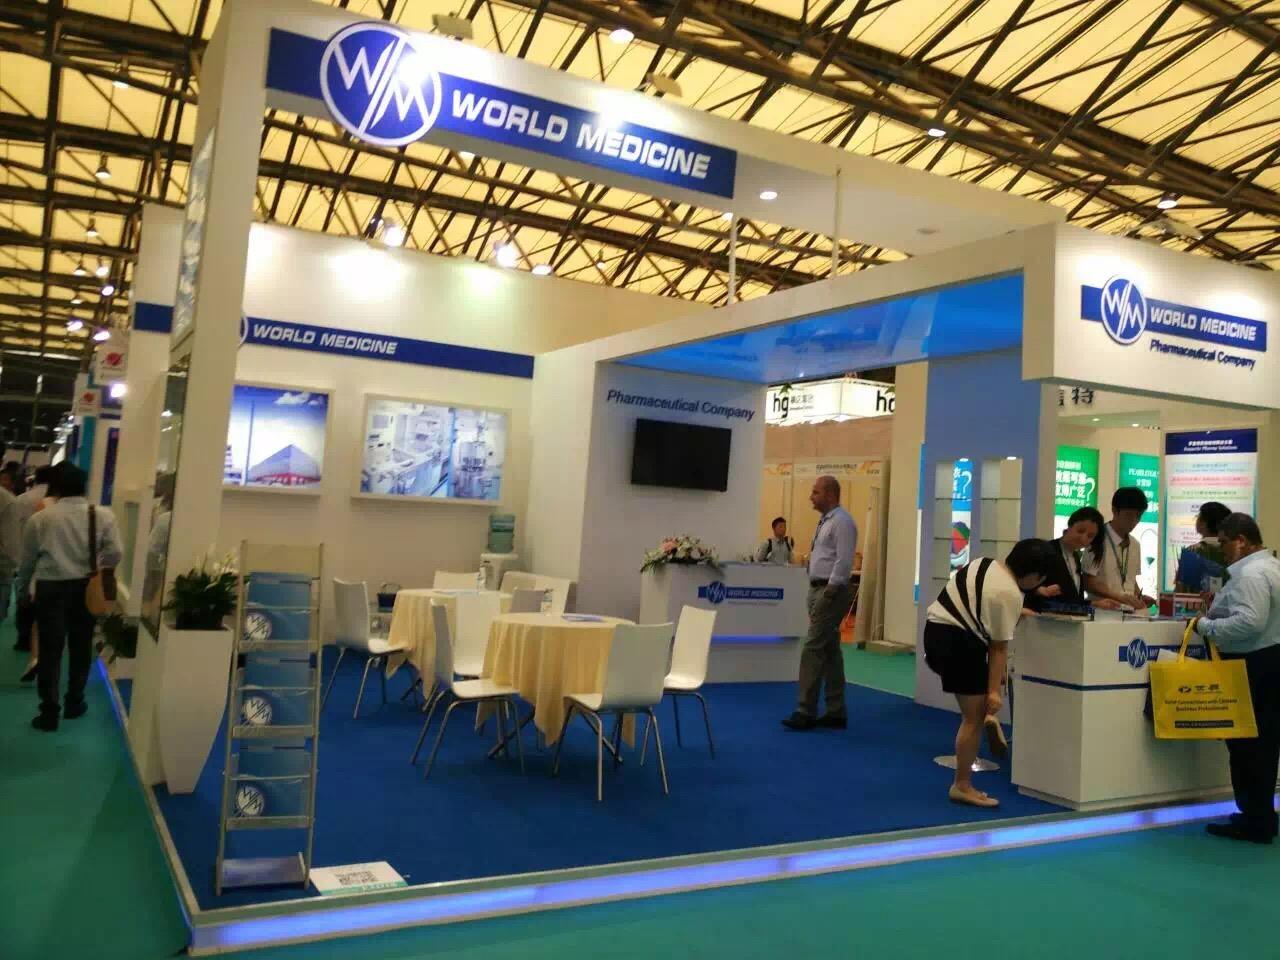 Exhibition Booth Decoration : Exhibition service beijing dosen international exhibition co ltd